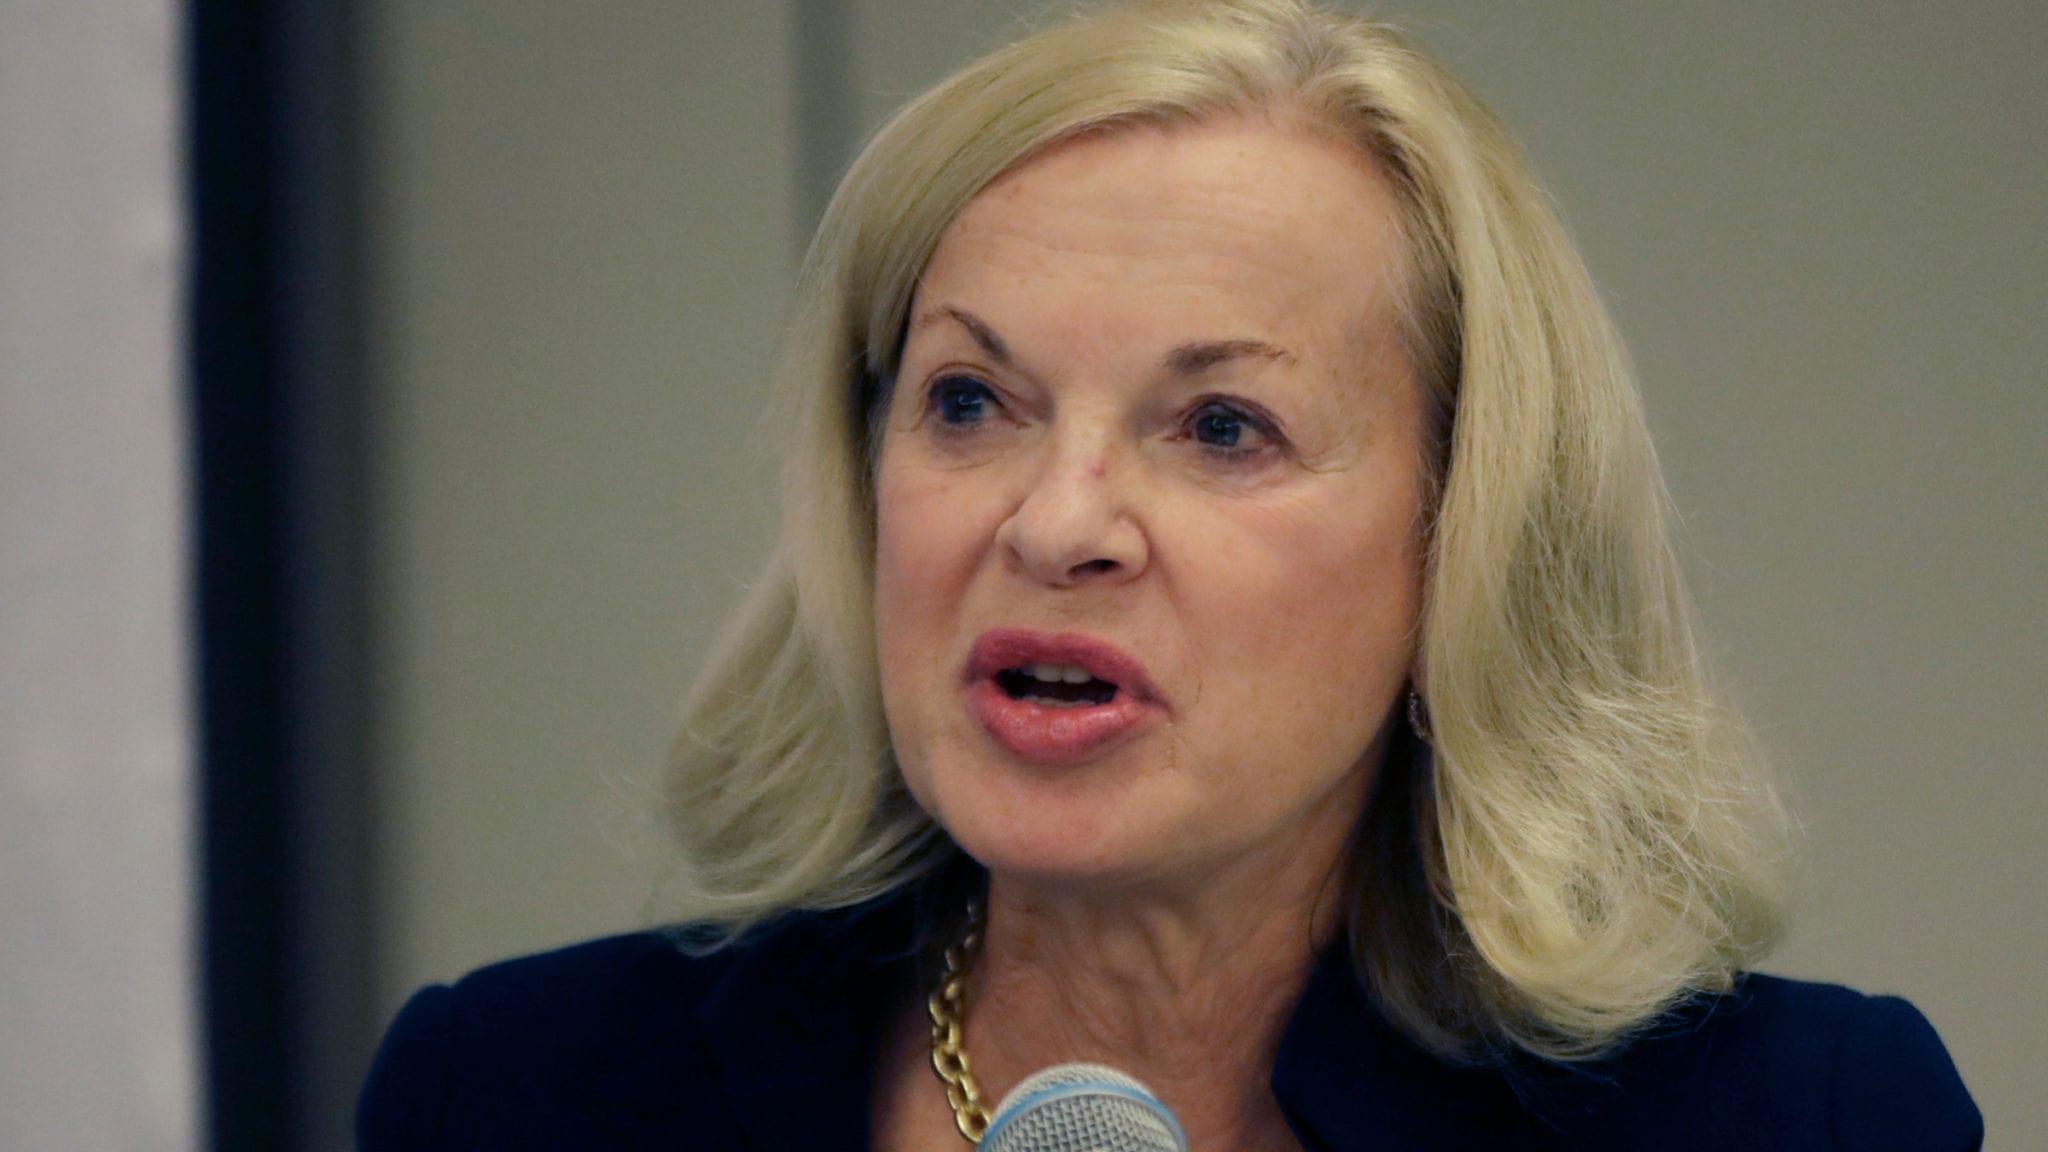 Brigham and Women's president Elizabeth Nabel follows Moncef Slaoui off Moderna's board